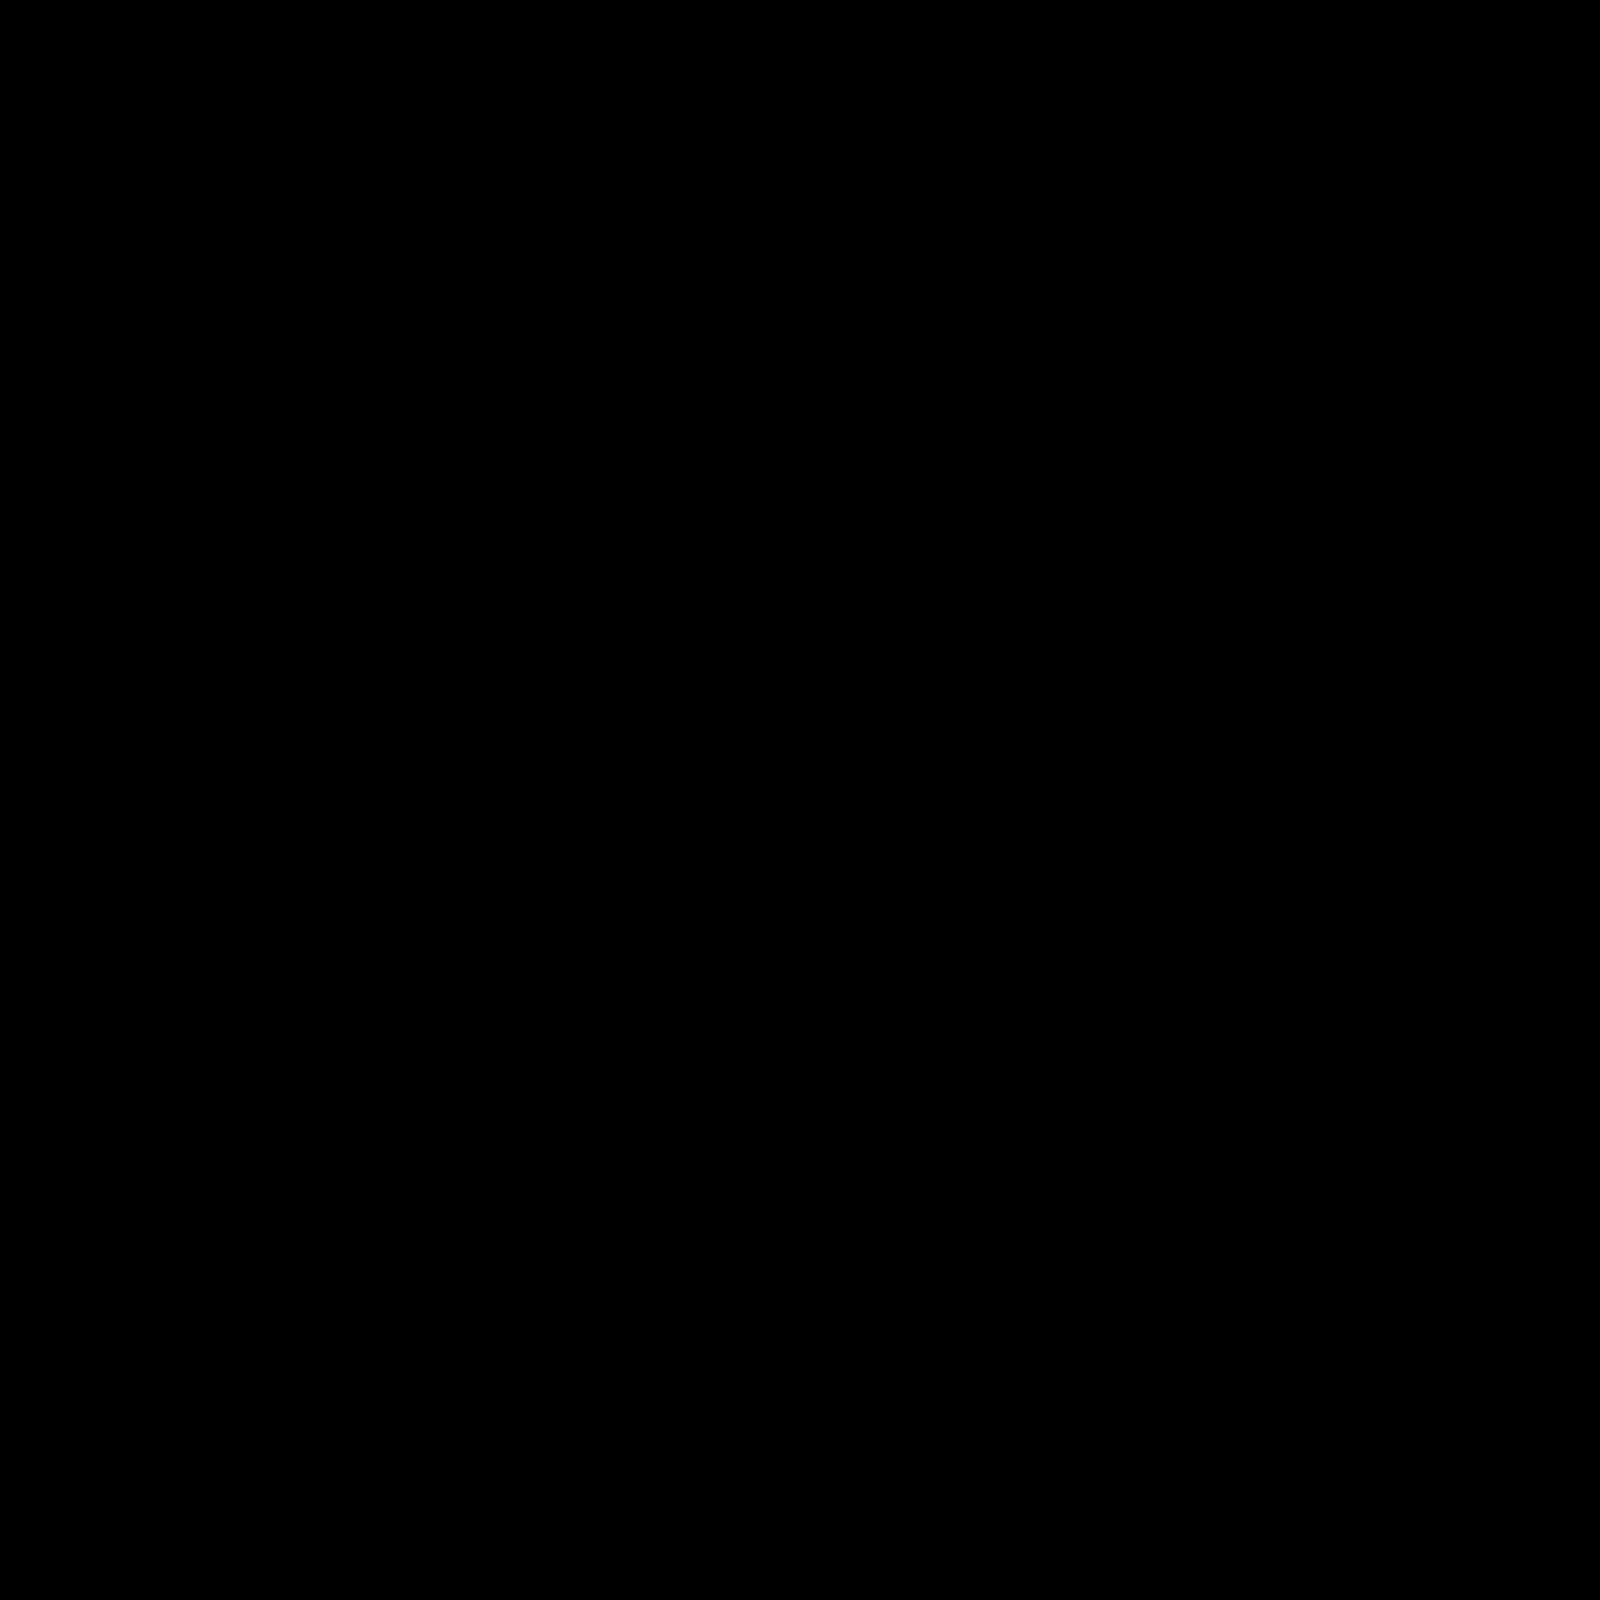 kisspng computer icons quotation symbol quotation 5ac1f74caa8627.6321369915226611966985 SEO Agentur SEOeffekt